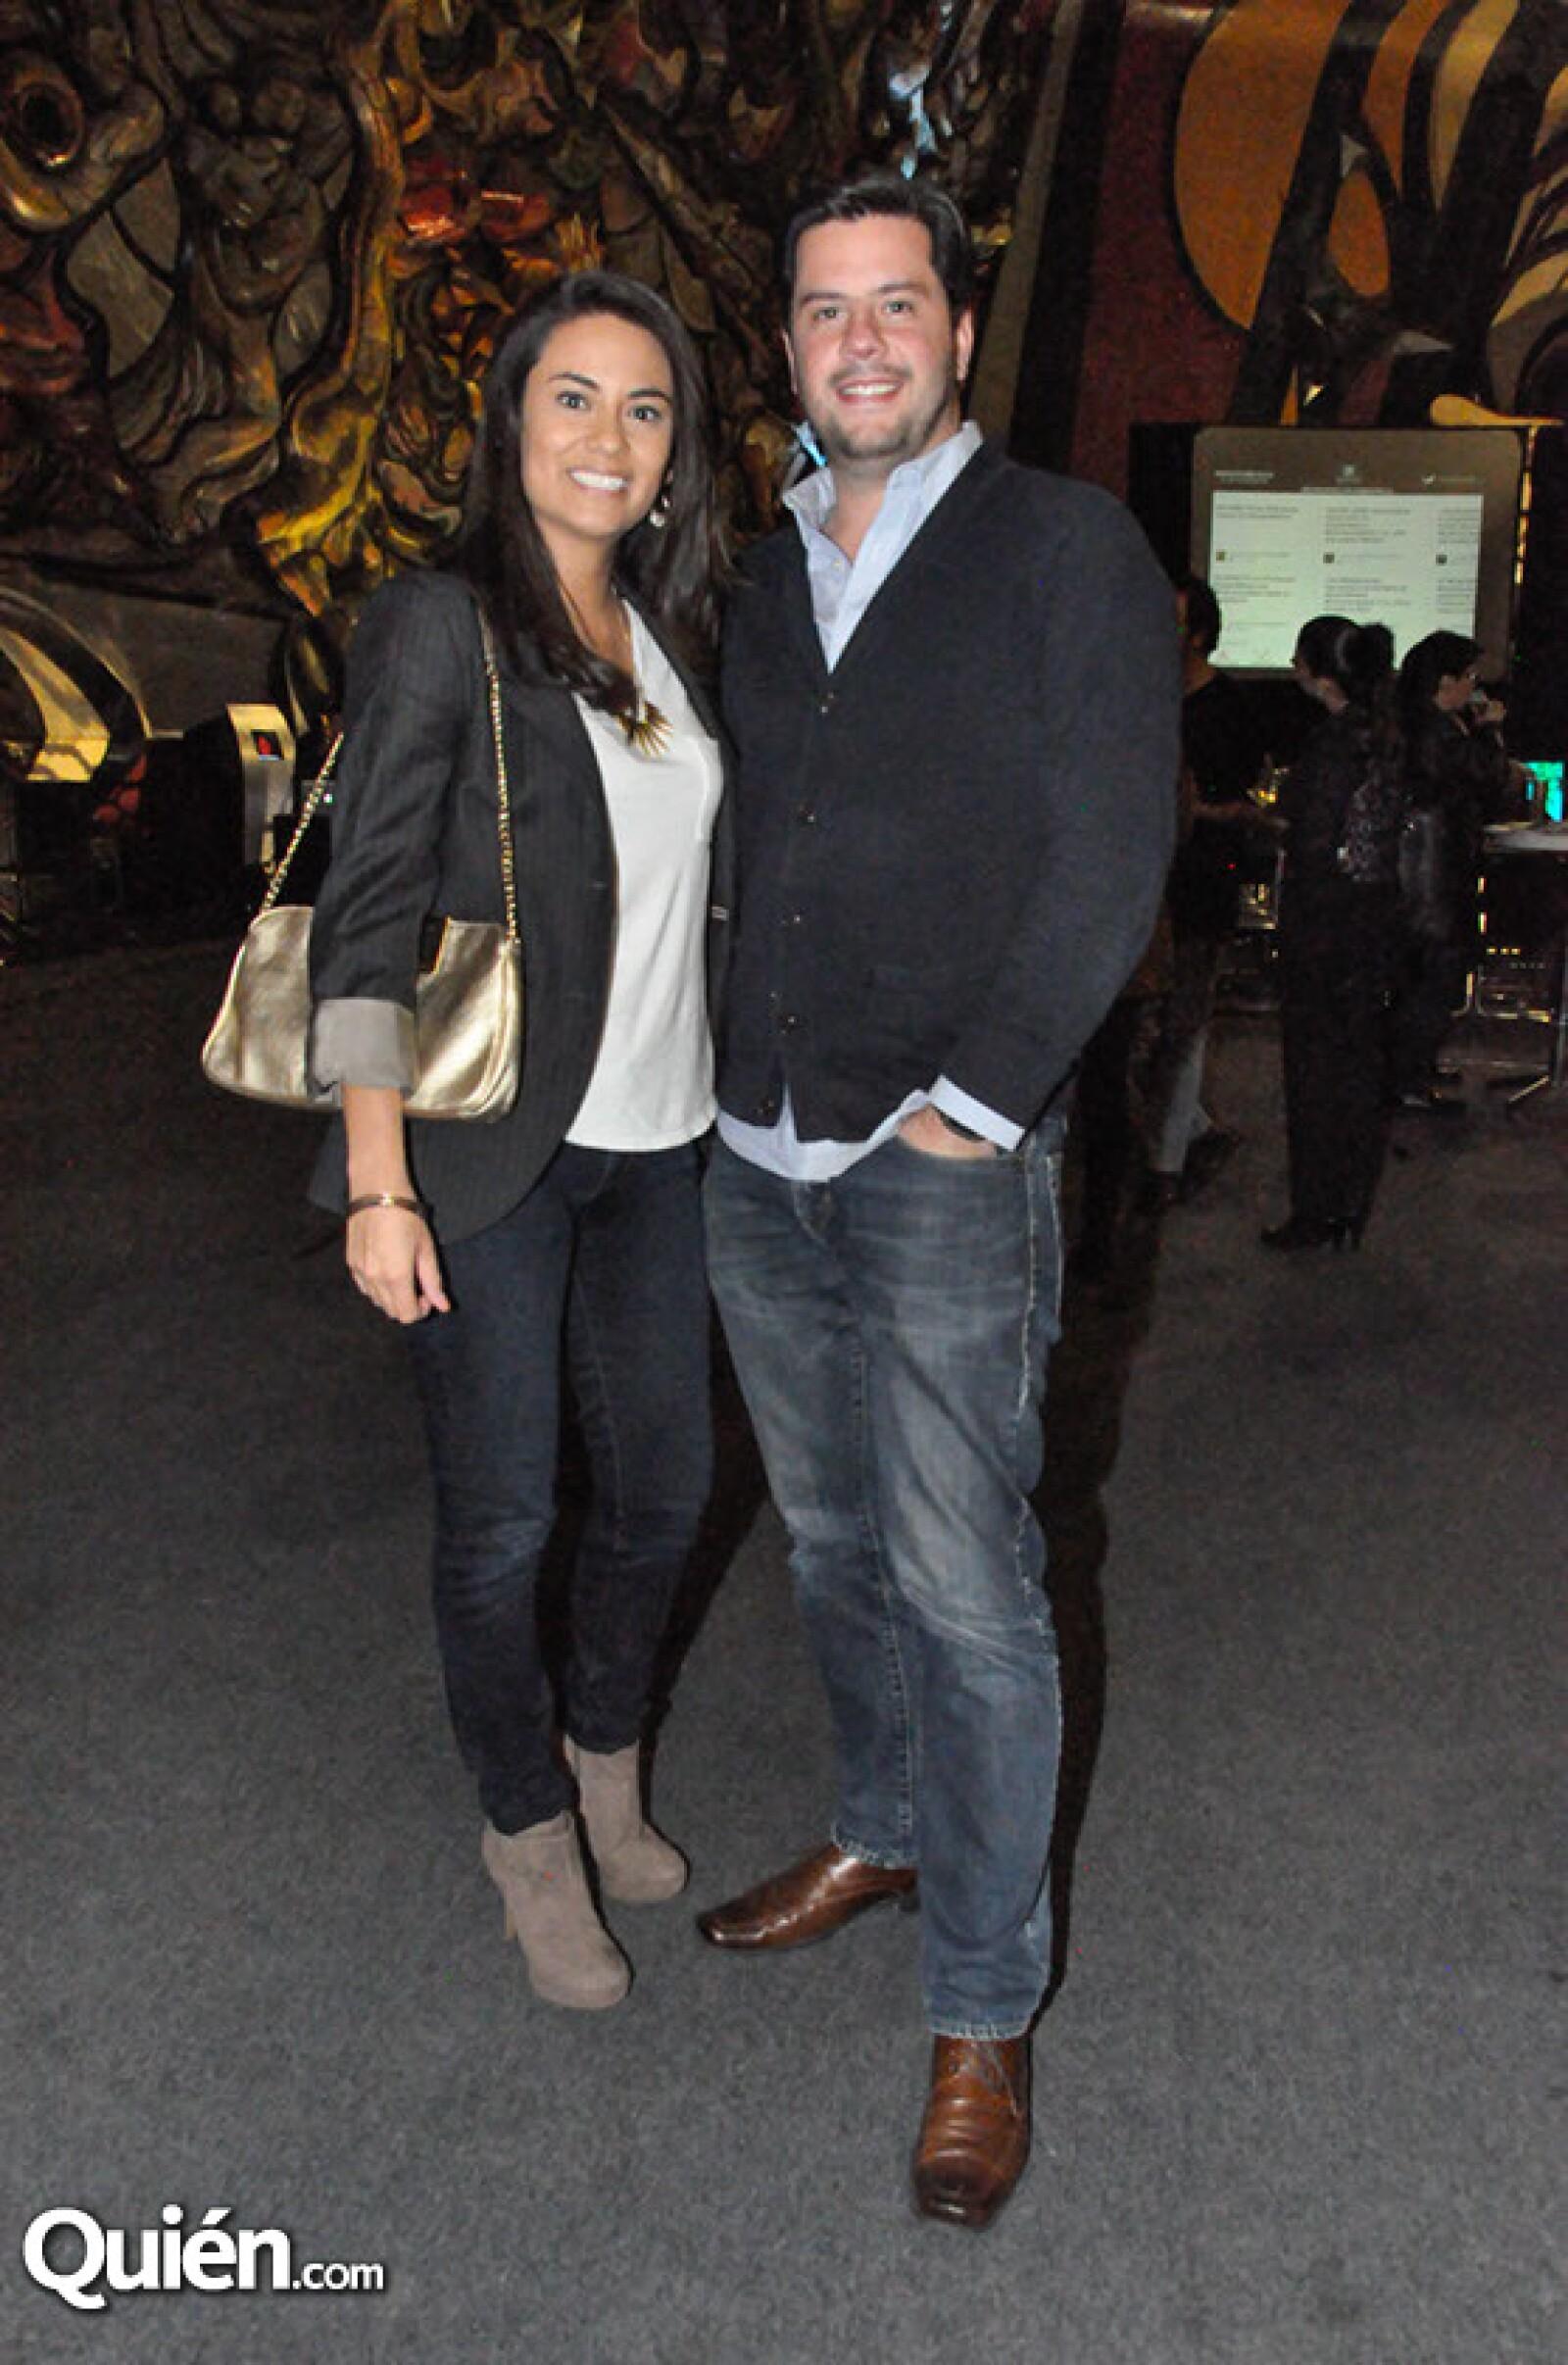 Cristina Gomezrrendon y Kristian Díaz Lebrija